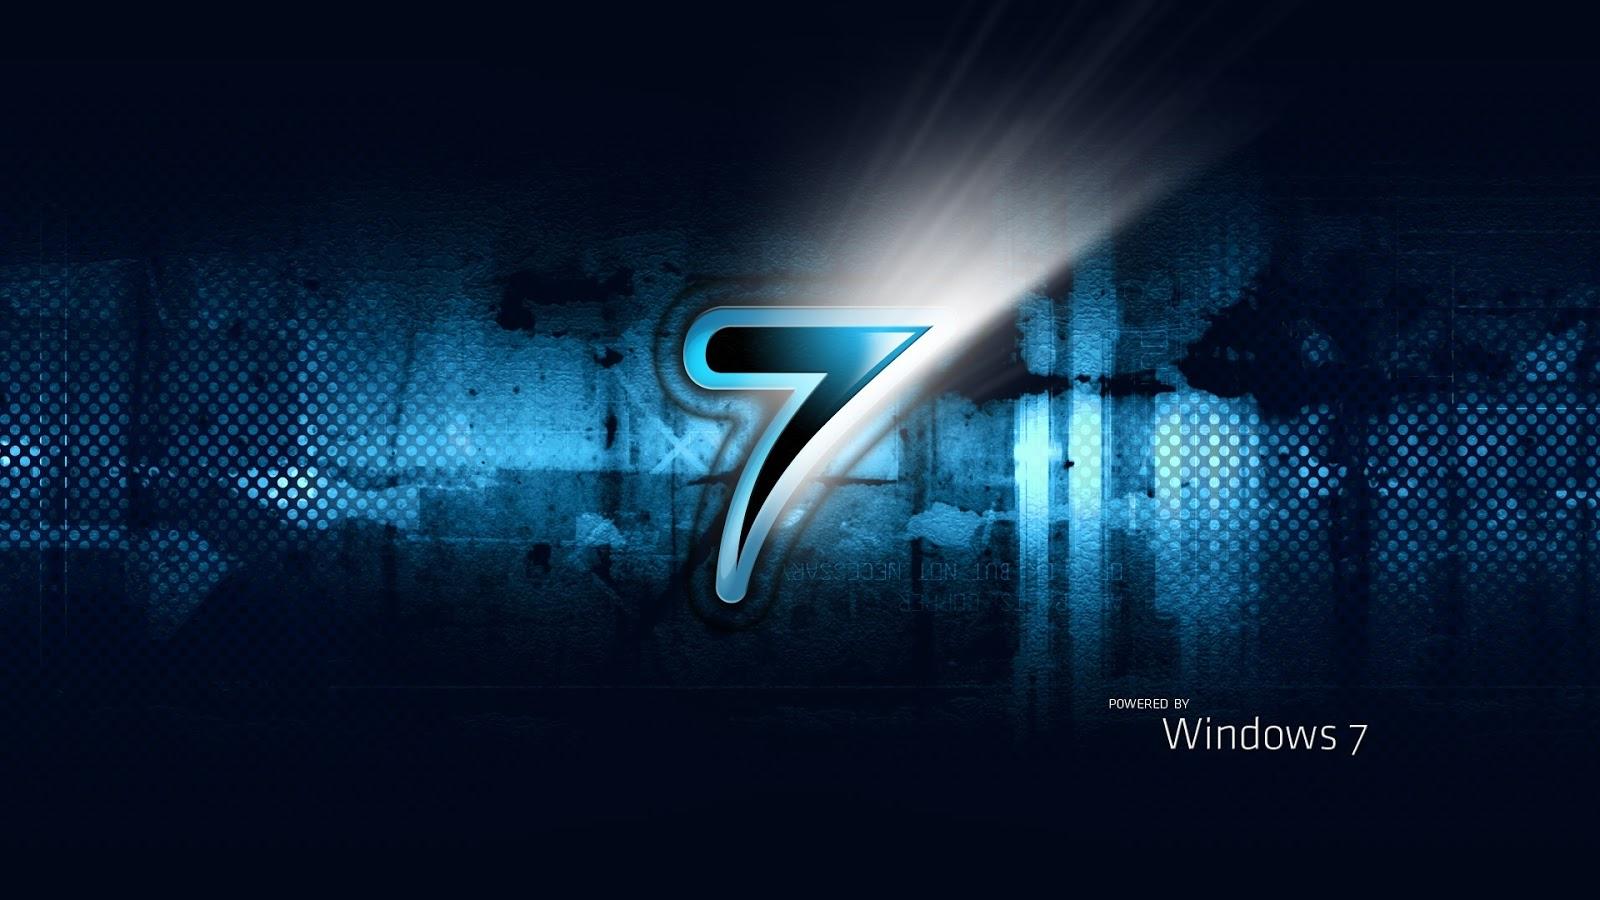 Download windows seven black 1024x768 wallpaper 1771 - On Soft